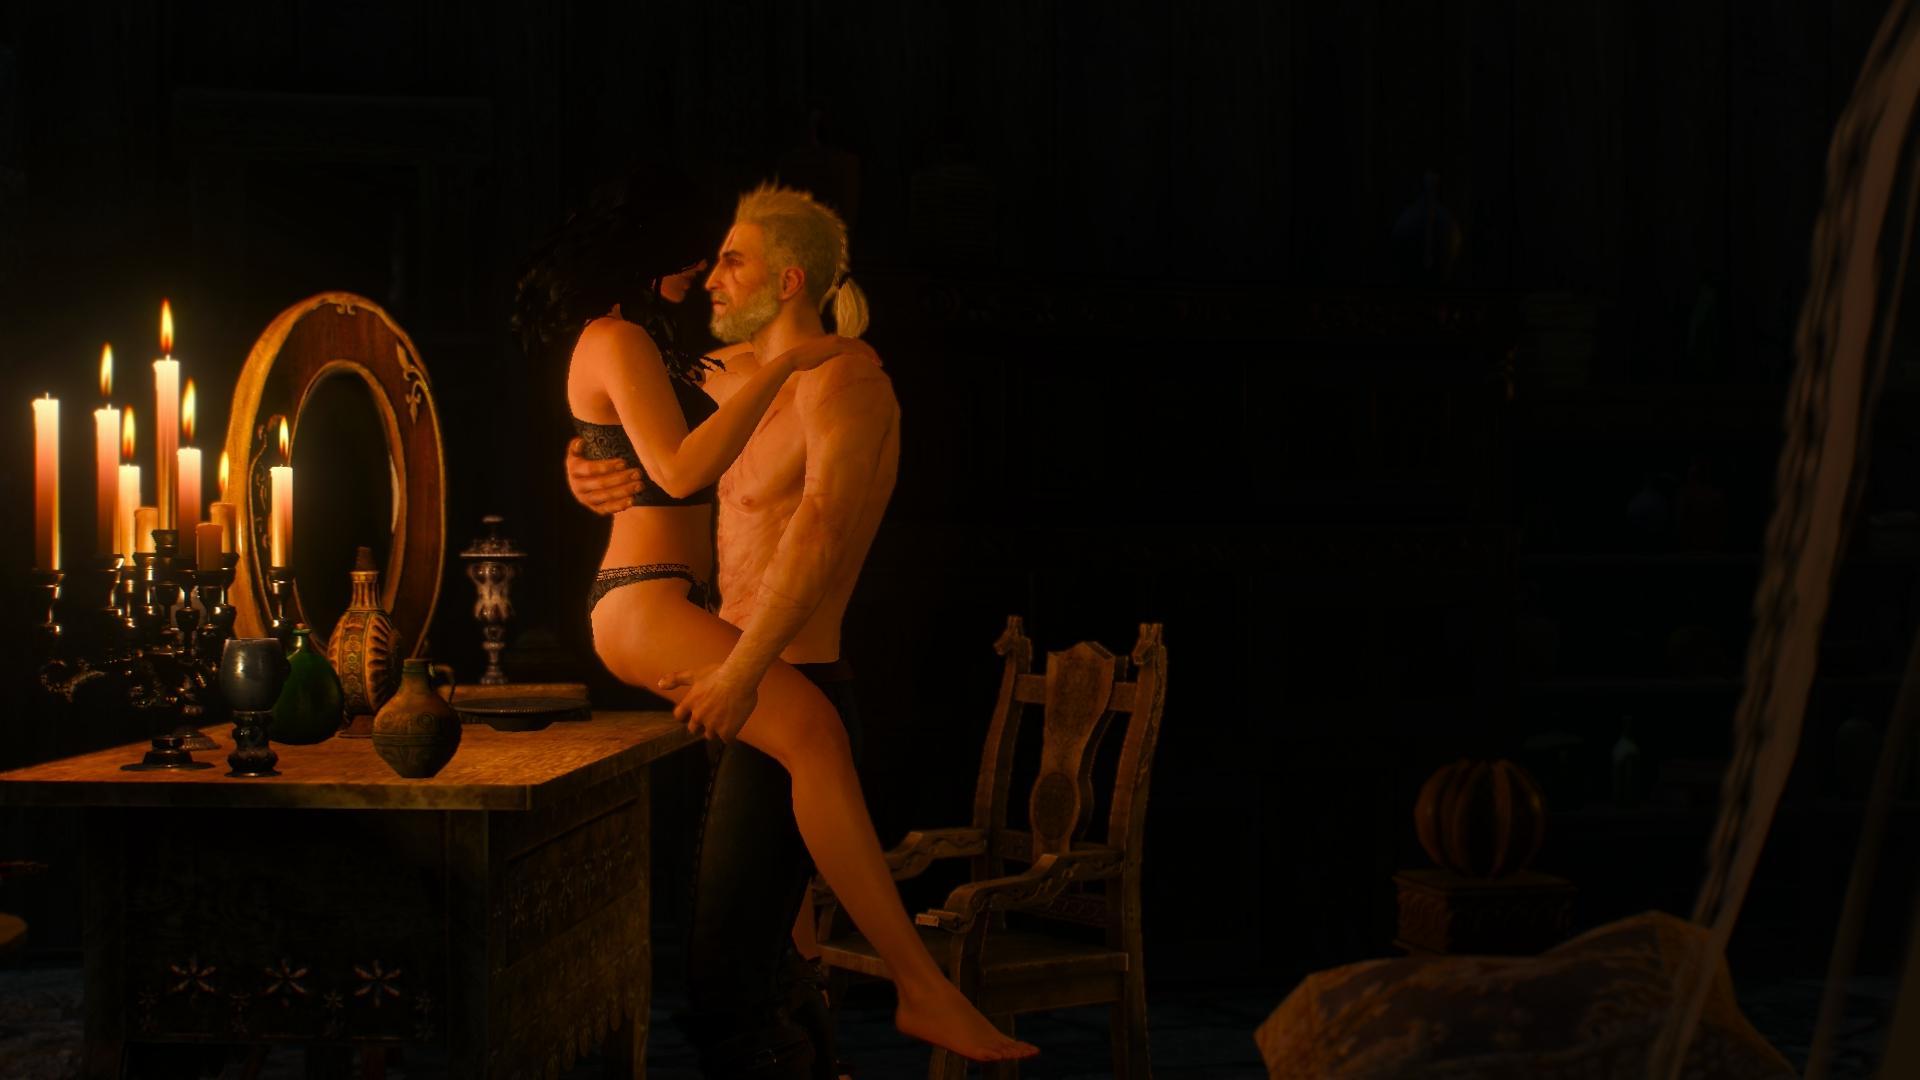 dildostange erotik filme lesben